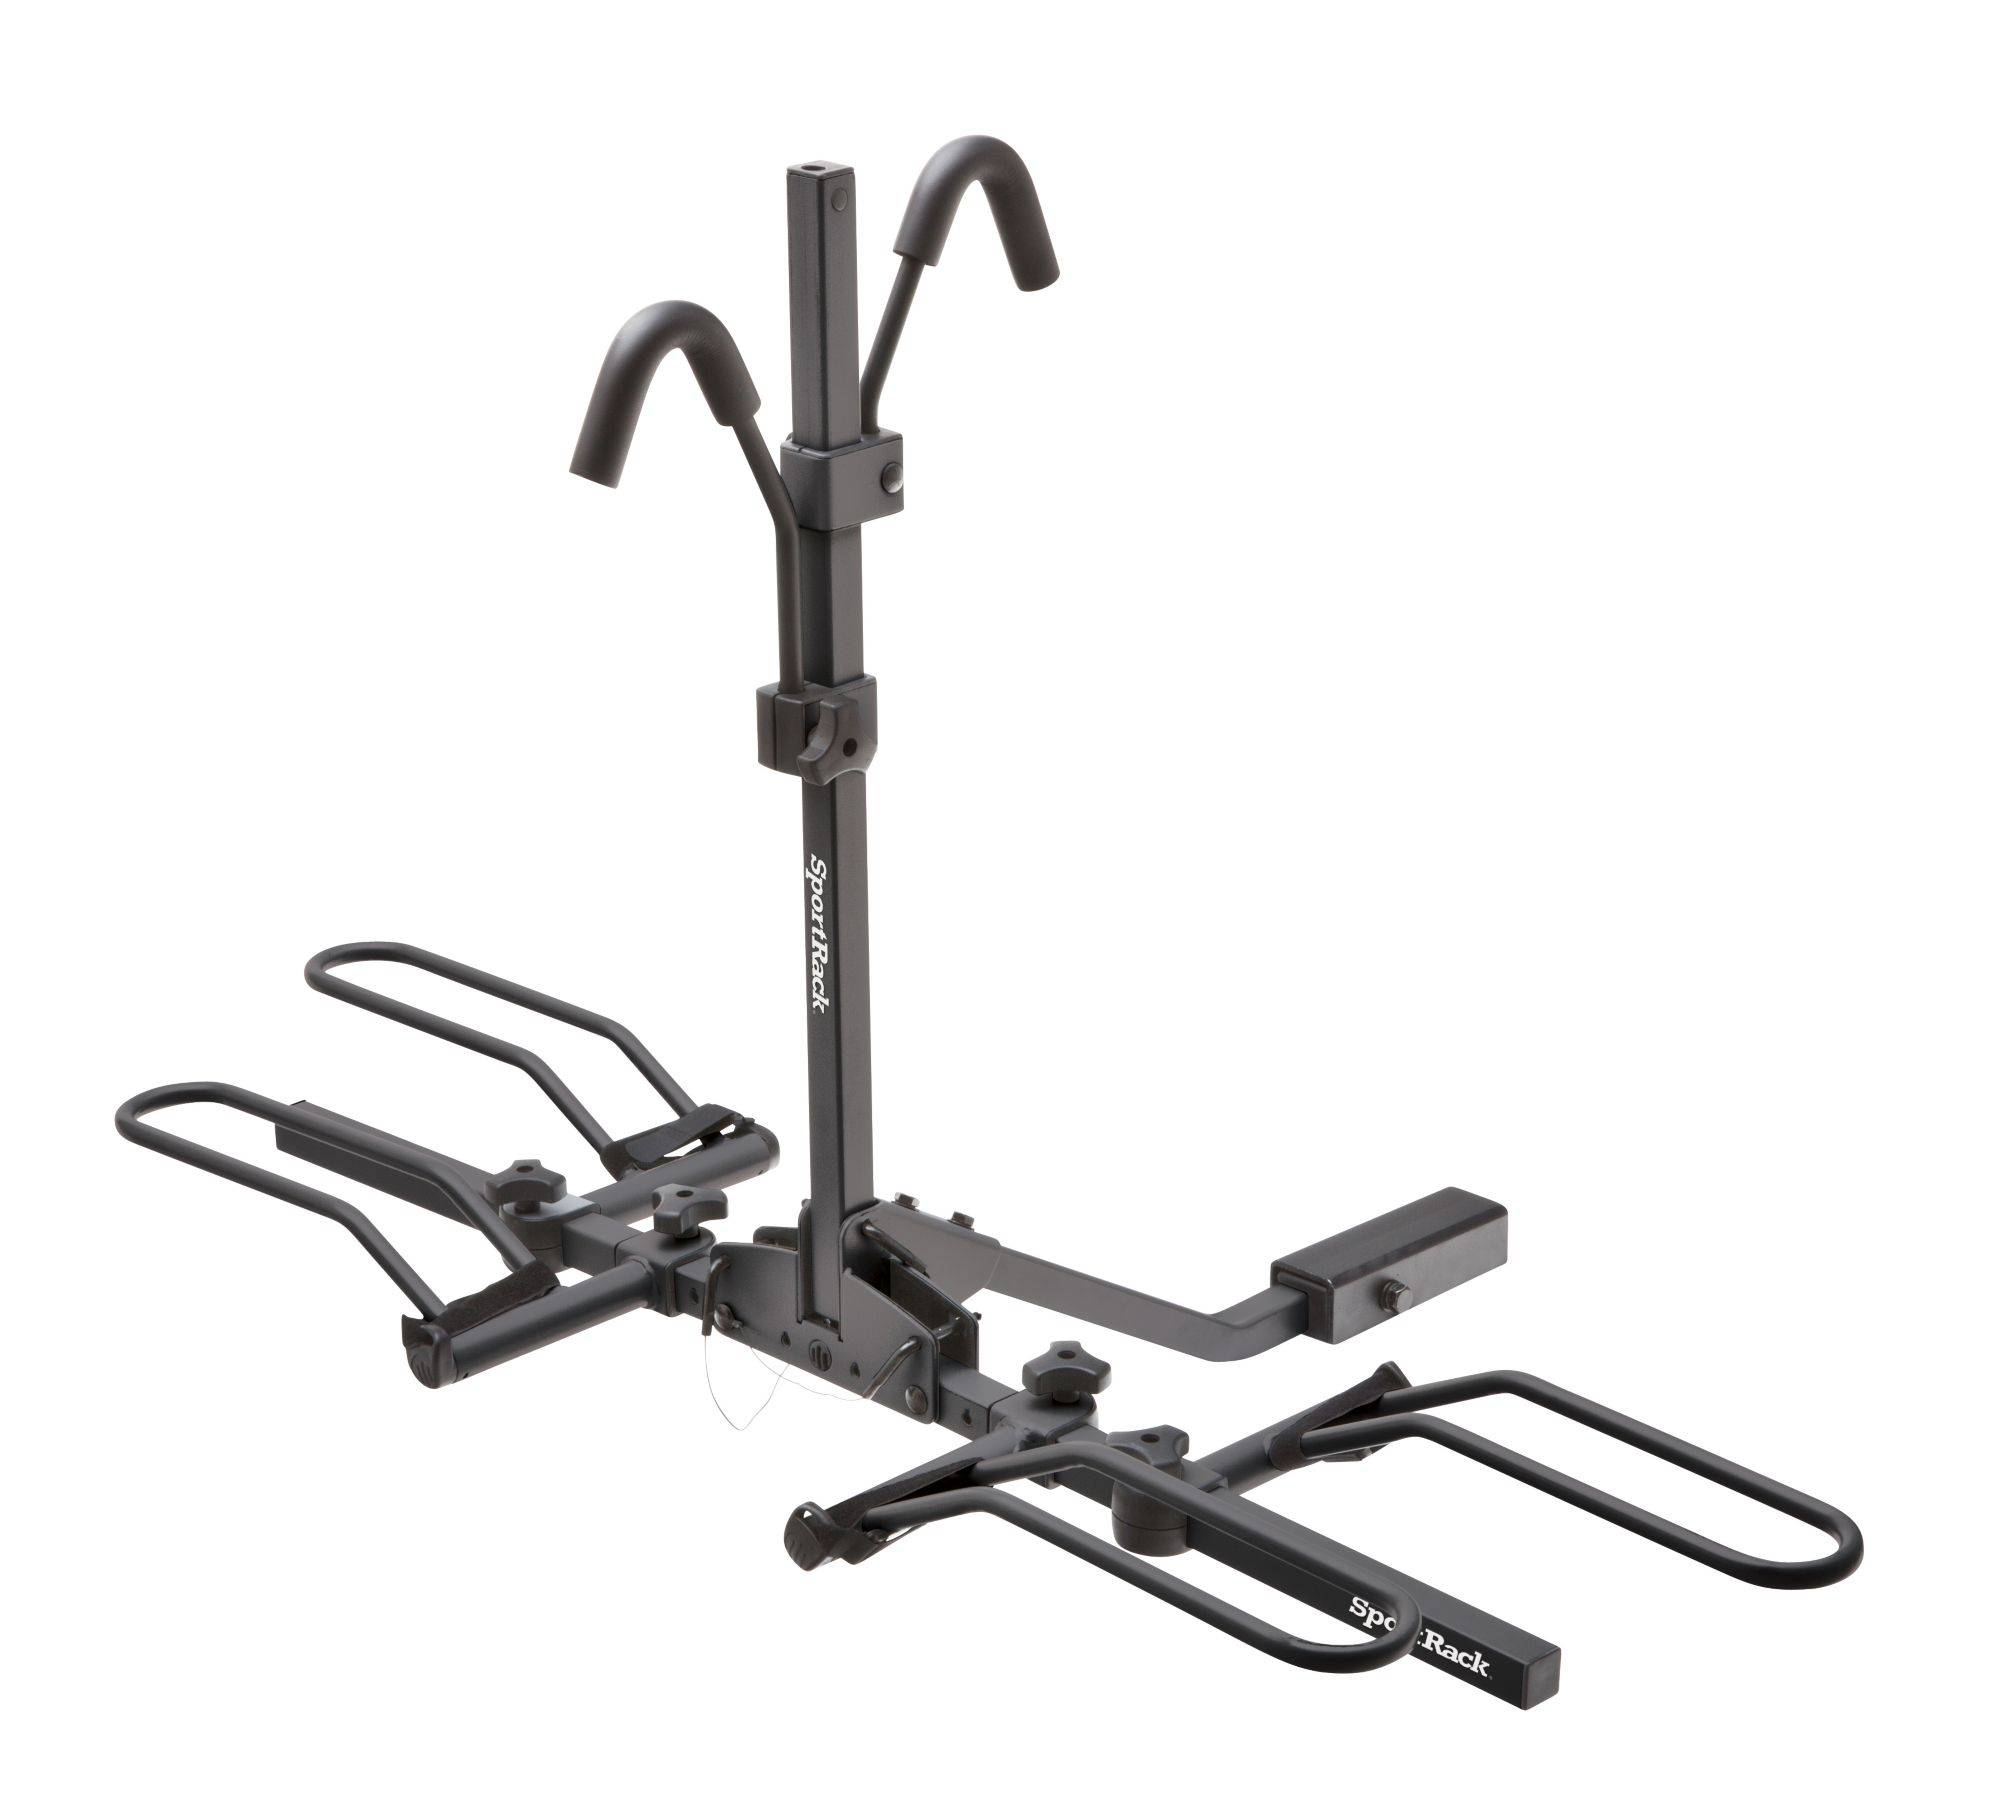 SportRack Crest 2 Hitch Mount 2-Bike Rack, Black